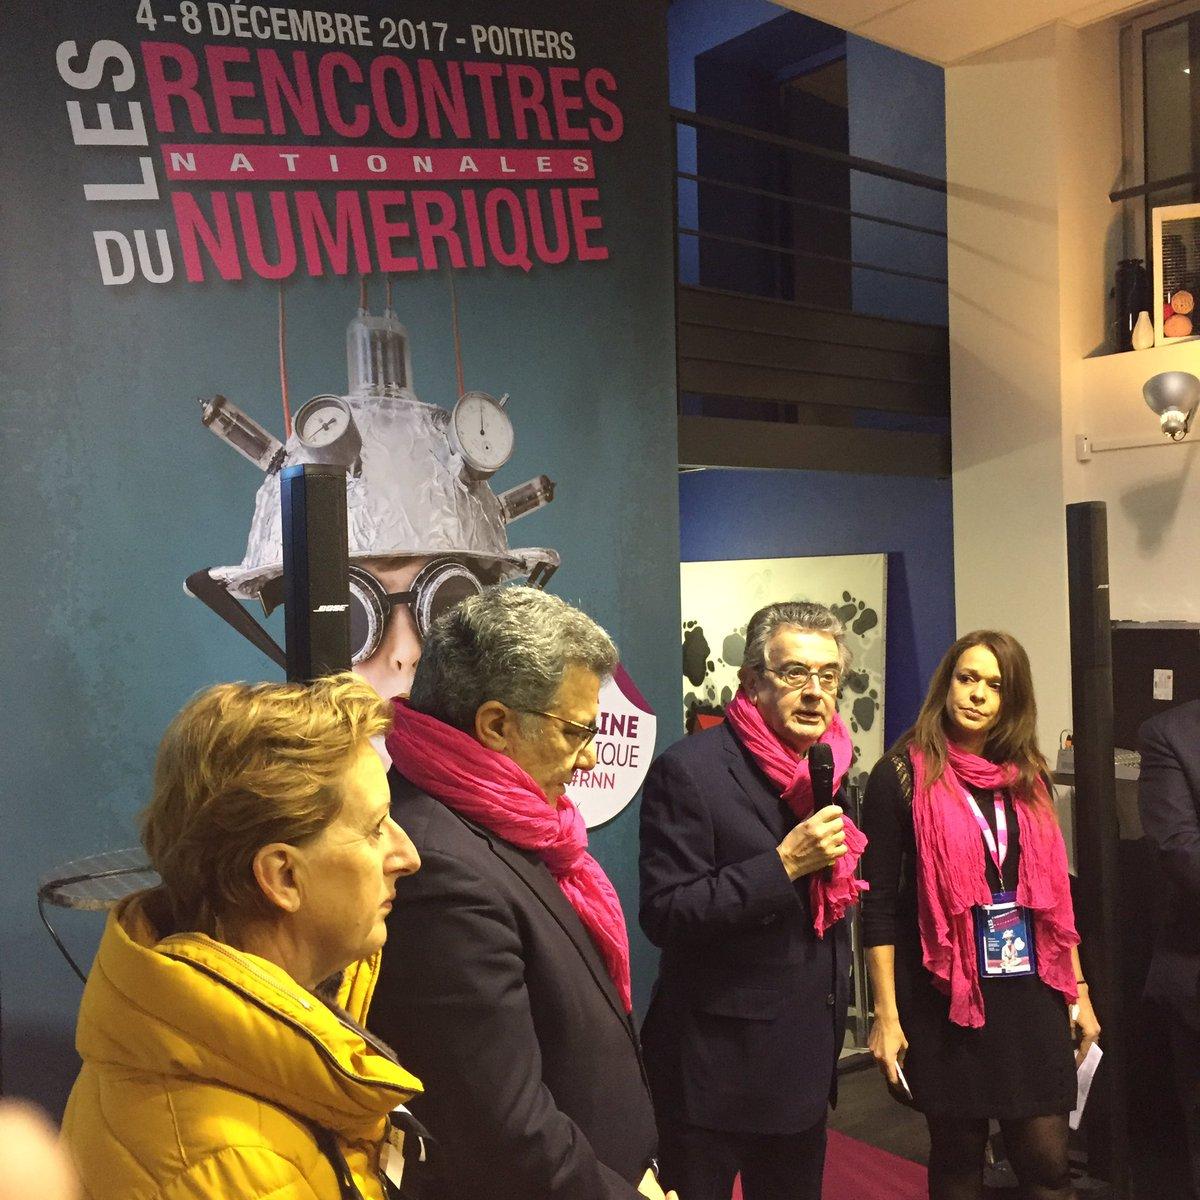 Discours d&#39;inauguration des #RNN2017. @reseauSPN @Grand_Poitiers @NvelleAquitaine @GroupeLaPoste<br>http://pic.twitter.com/PA8KrCE4Mn